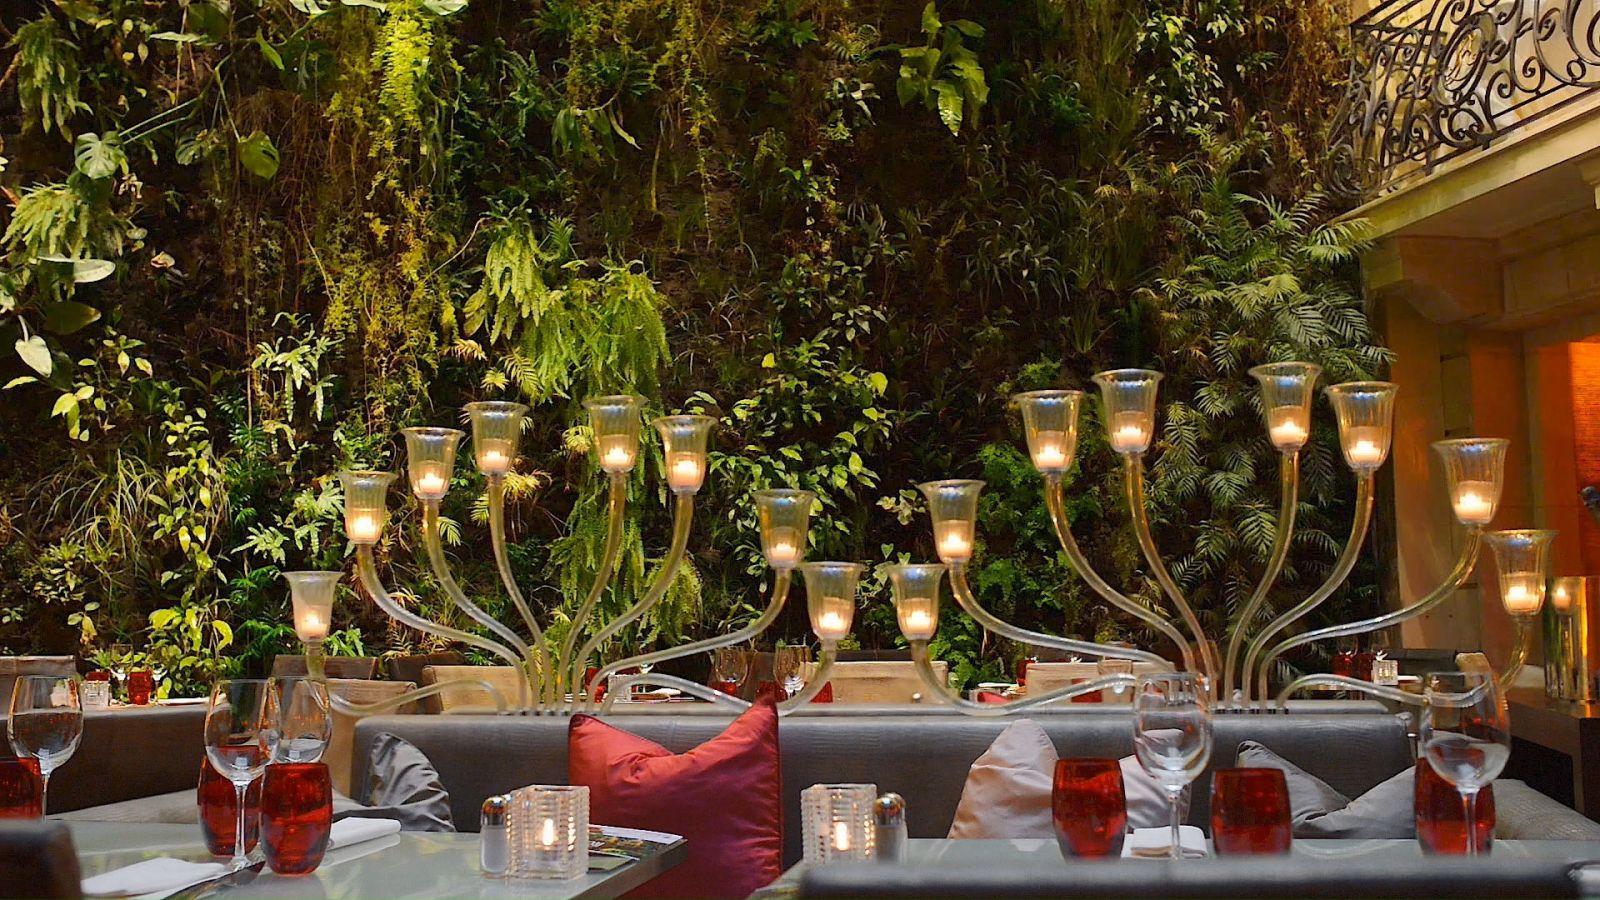 Restaurant luxe Paris - Hotel 5 etoiles Pershing Hall